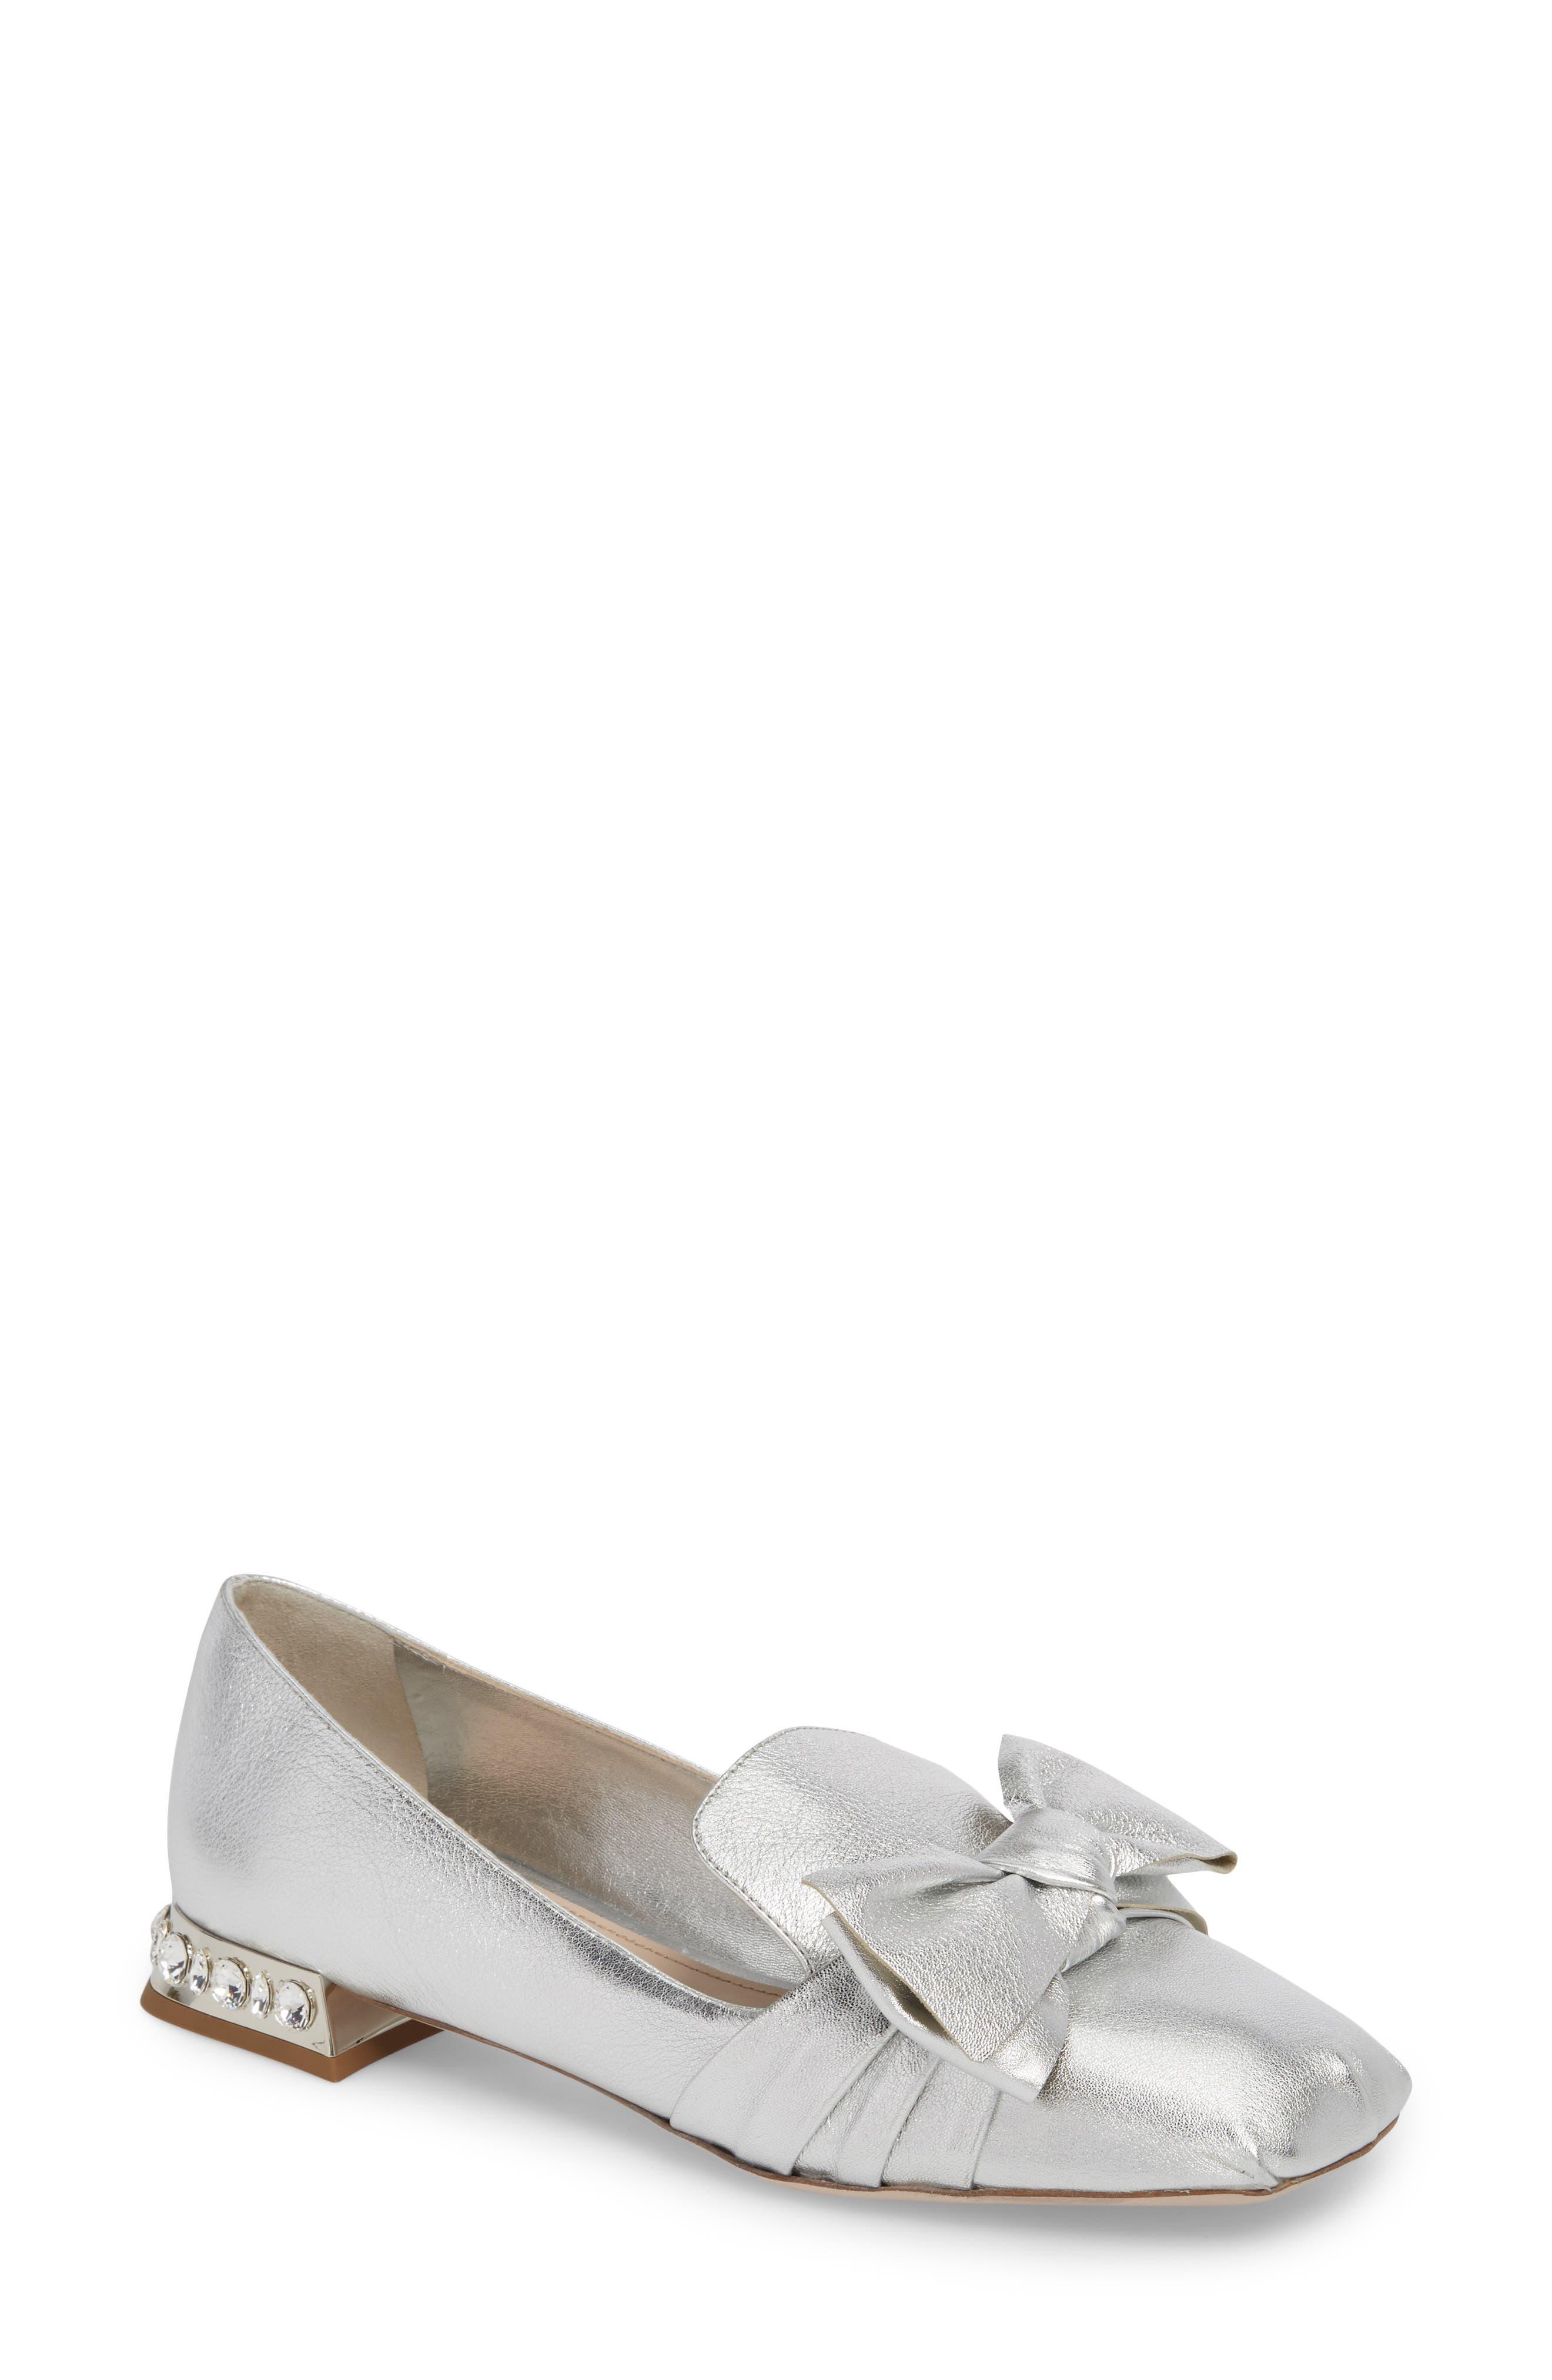 Miu Miu Embellished Heel Bow Loafer (Women)